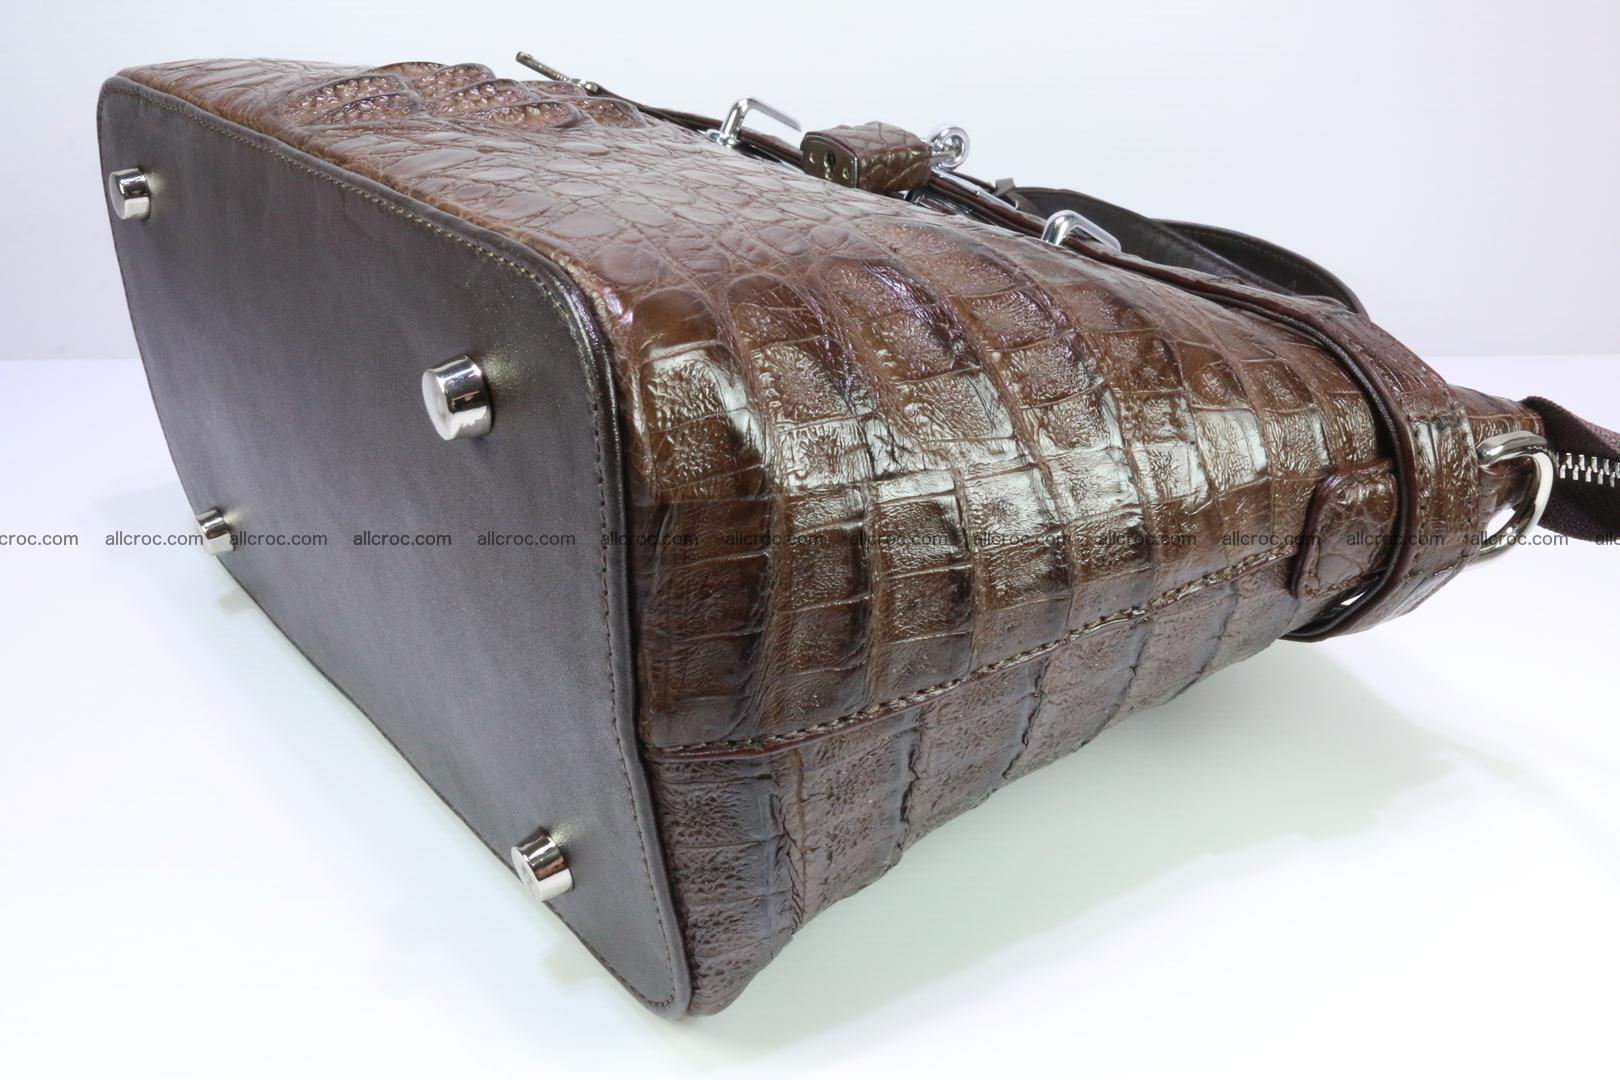 Genuine crocodile handbag for ladies 050 Foto 12